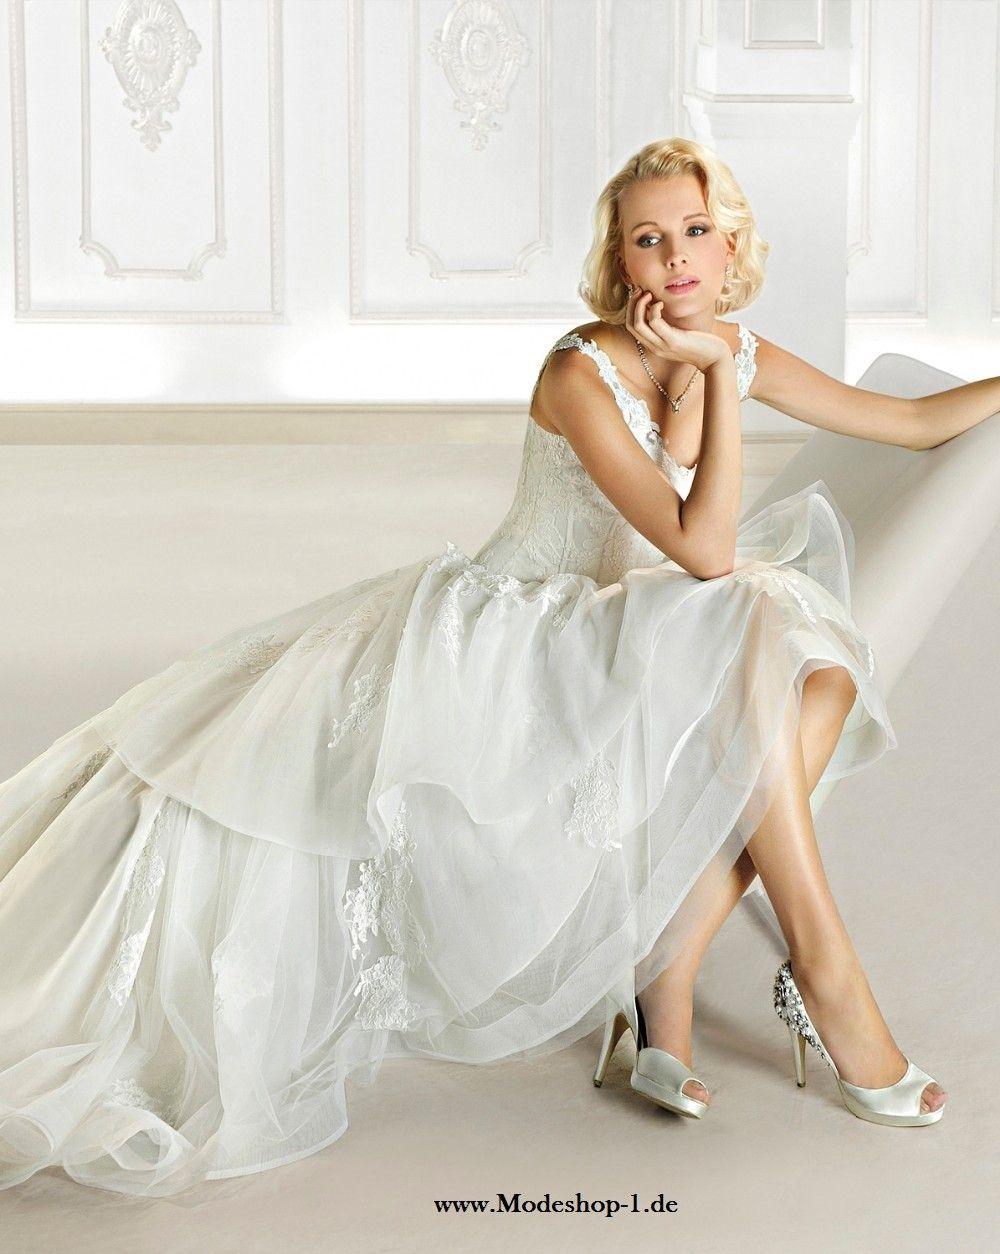 Atemberaubend Brautkleider Spokane Wa Ideen - Brautkleider Ideen ...